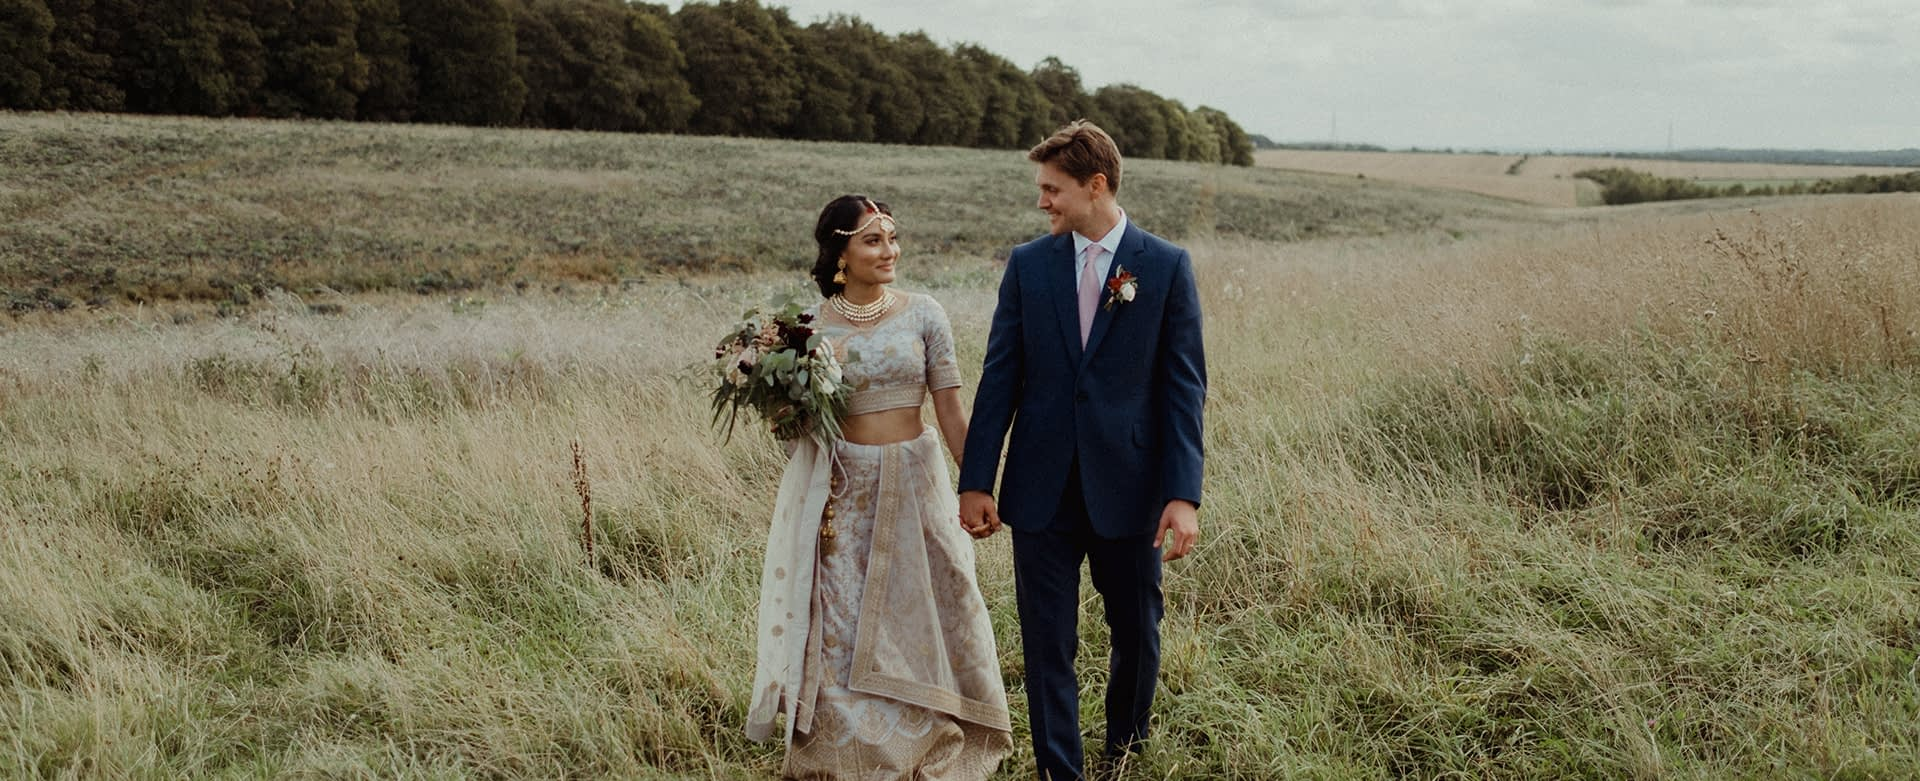 Sophia & Danny's Stone Barn Wedding